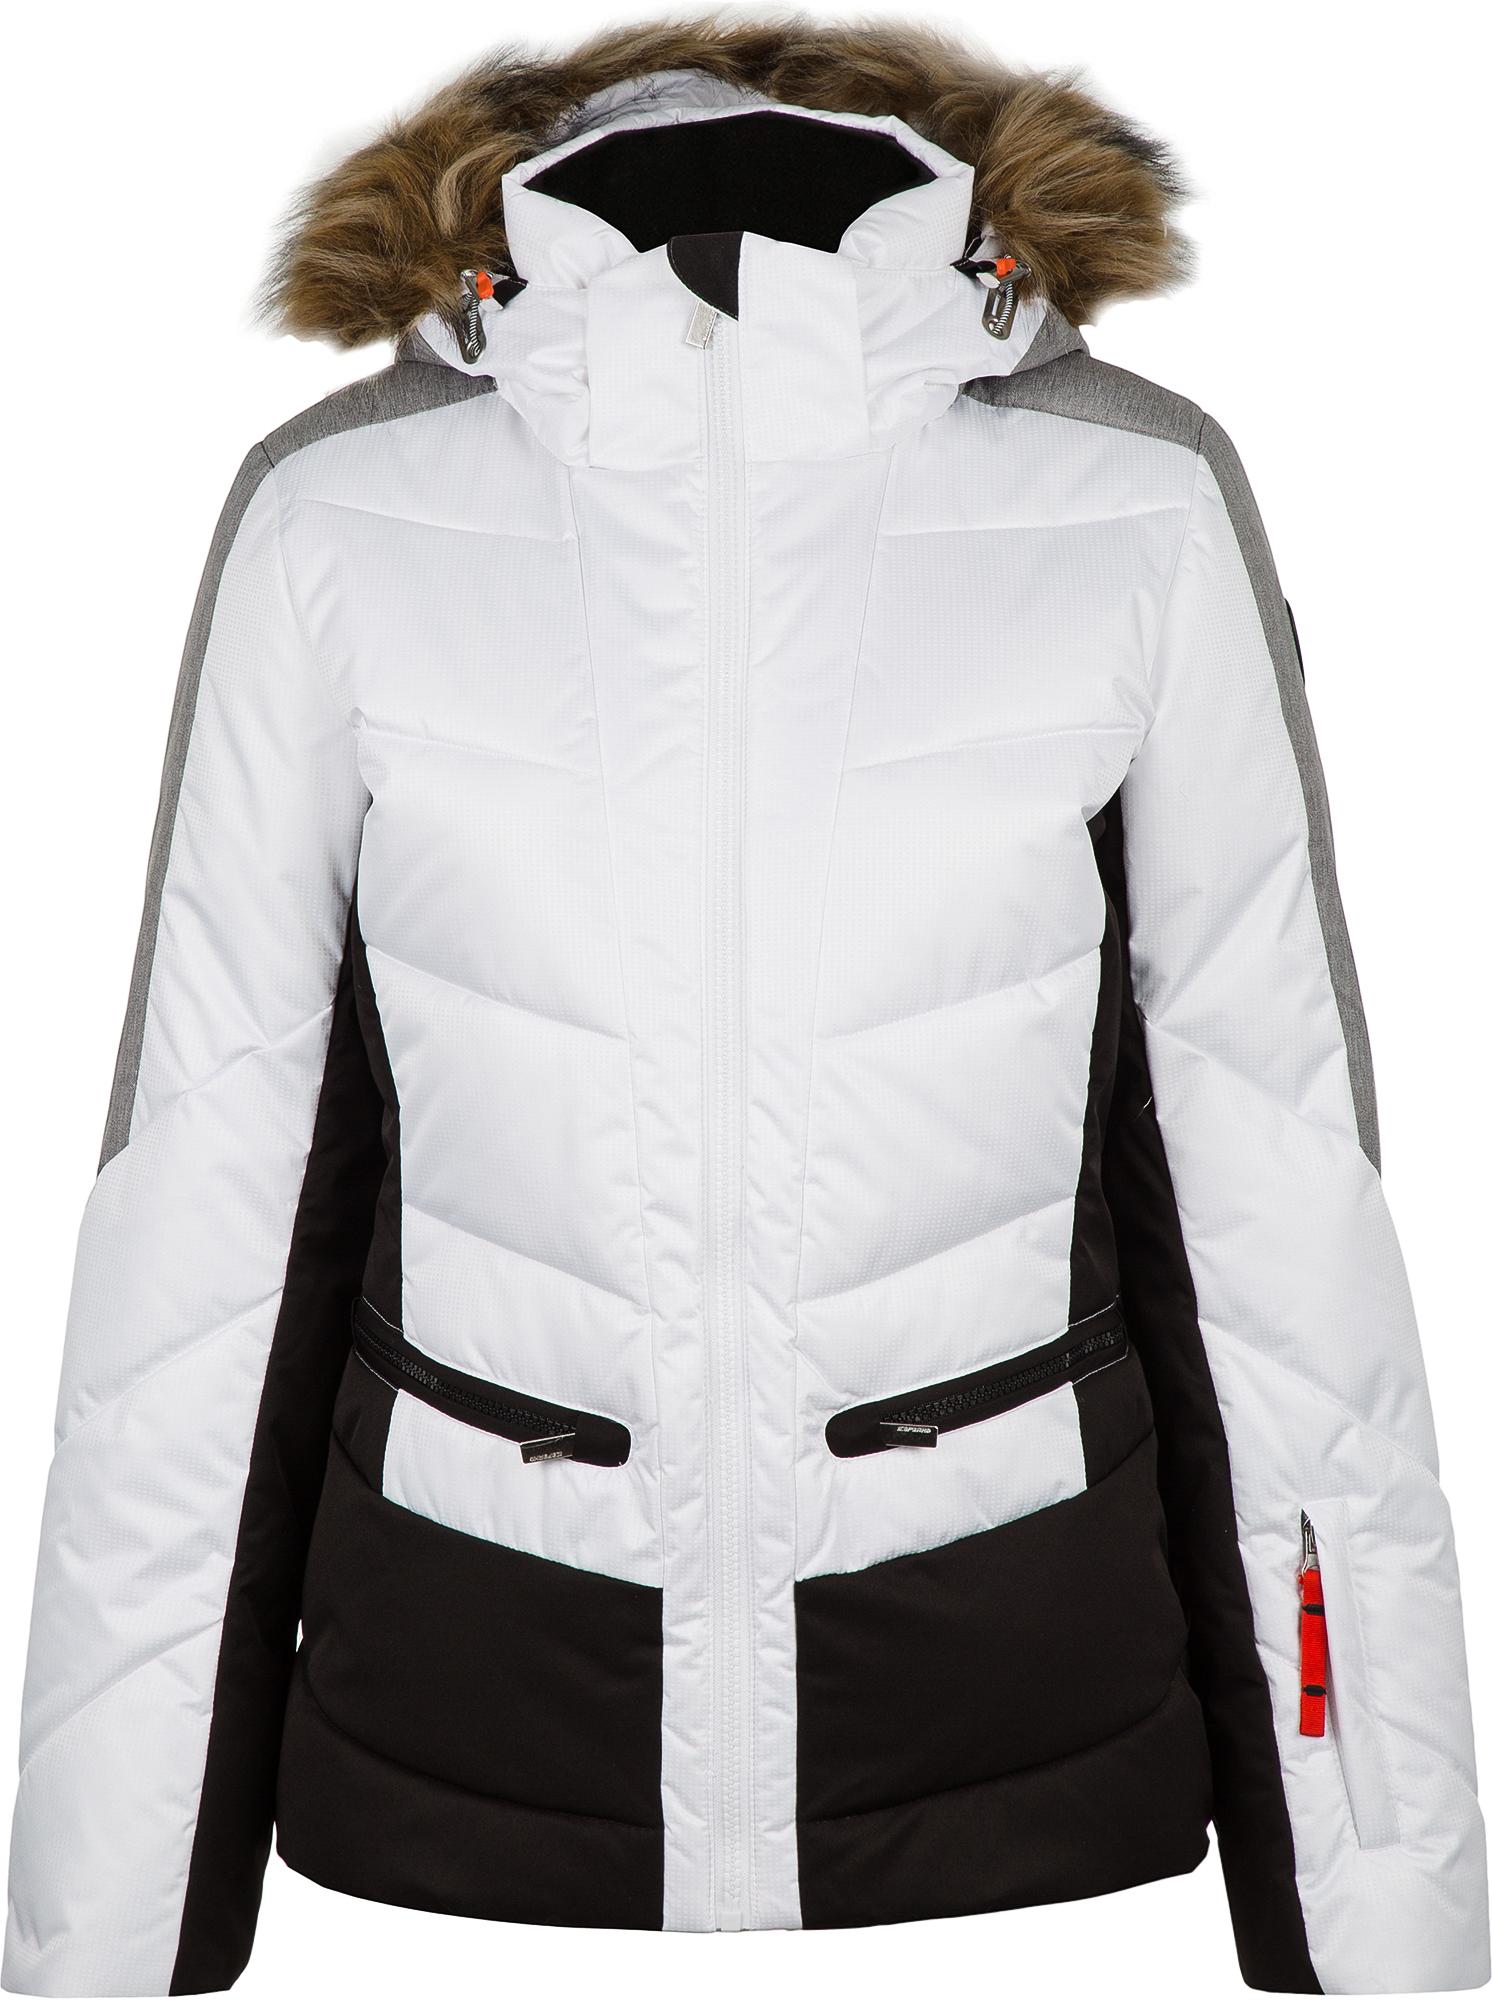 IcePeak Куртка утепленная женская IcePeak Electra, размер 46 цена 2017